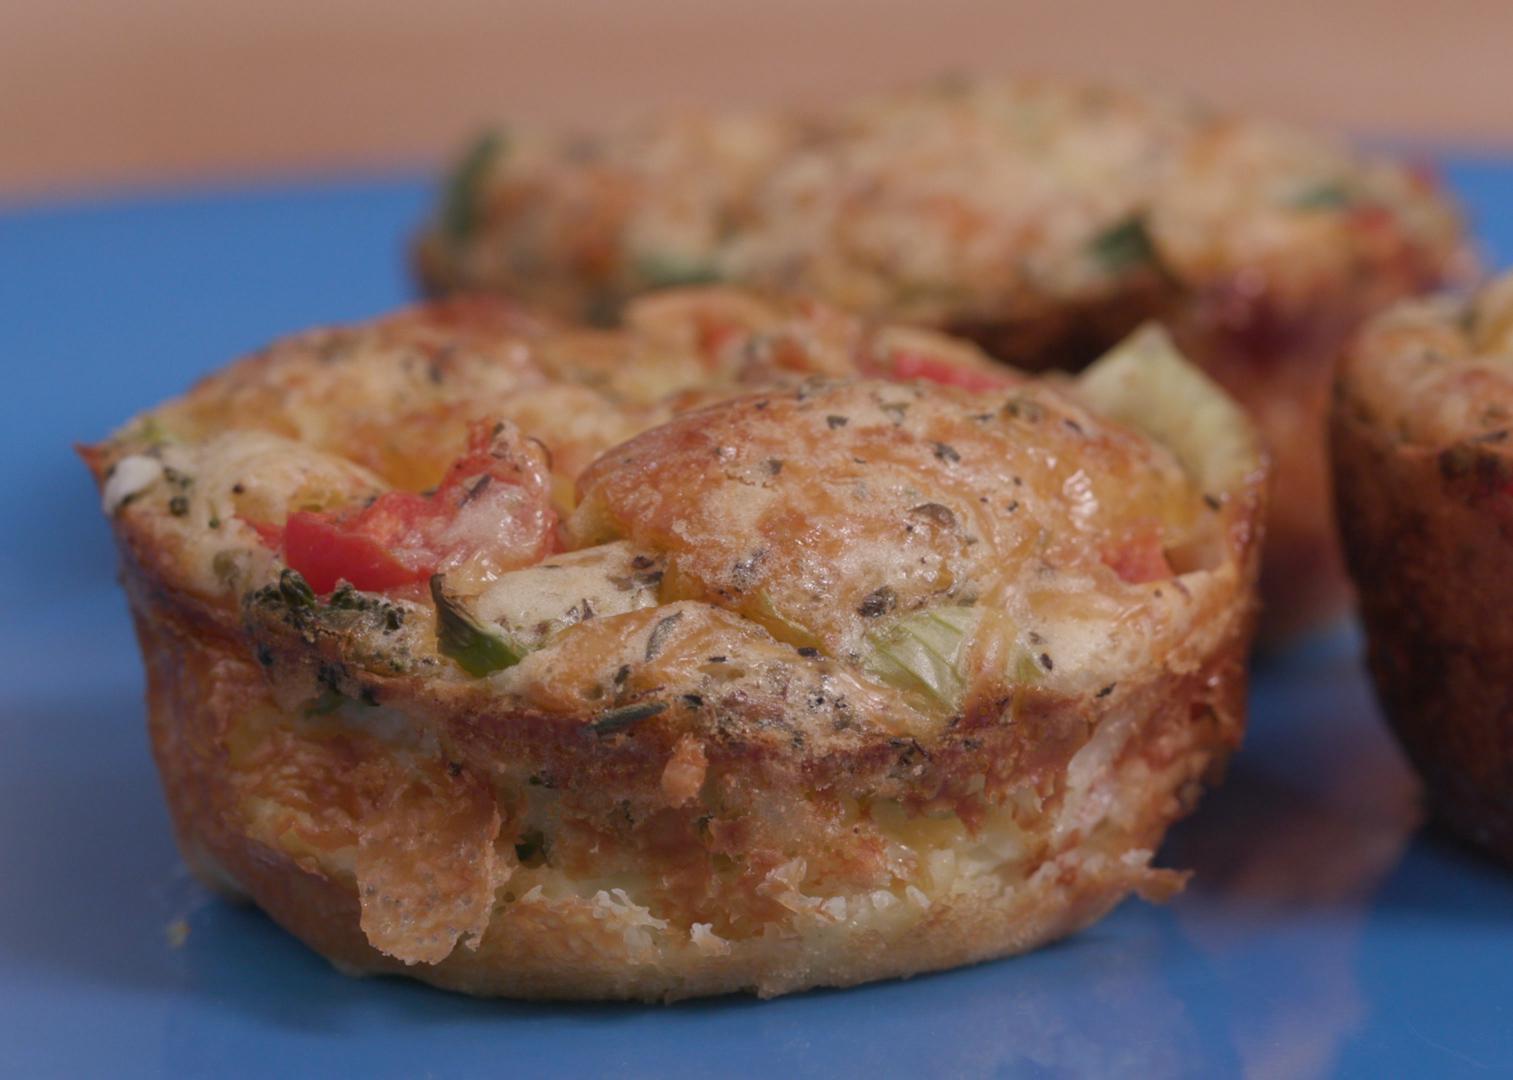 Veggie quiche muffins on a blue plate